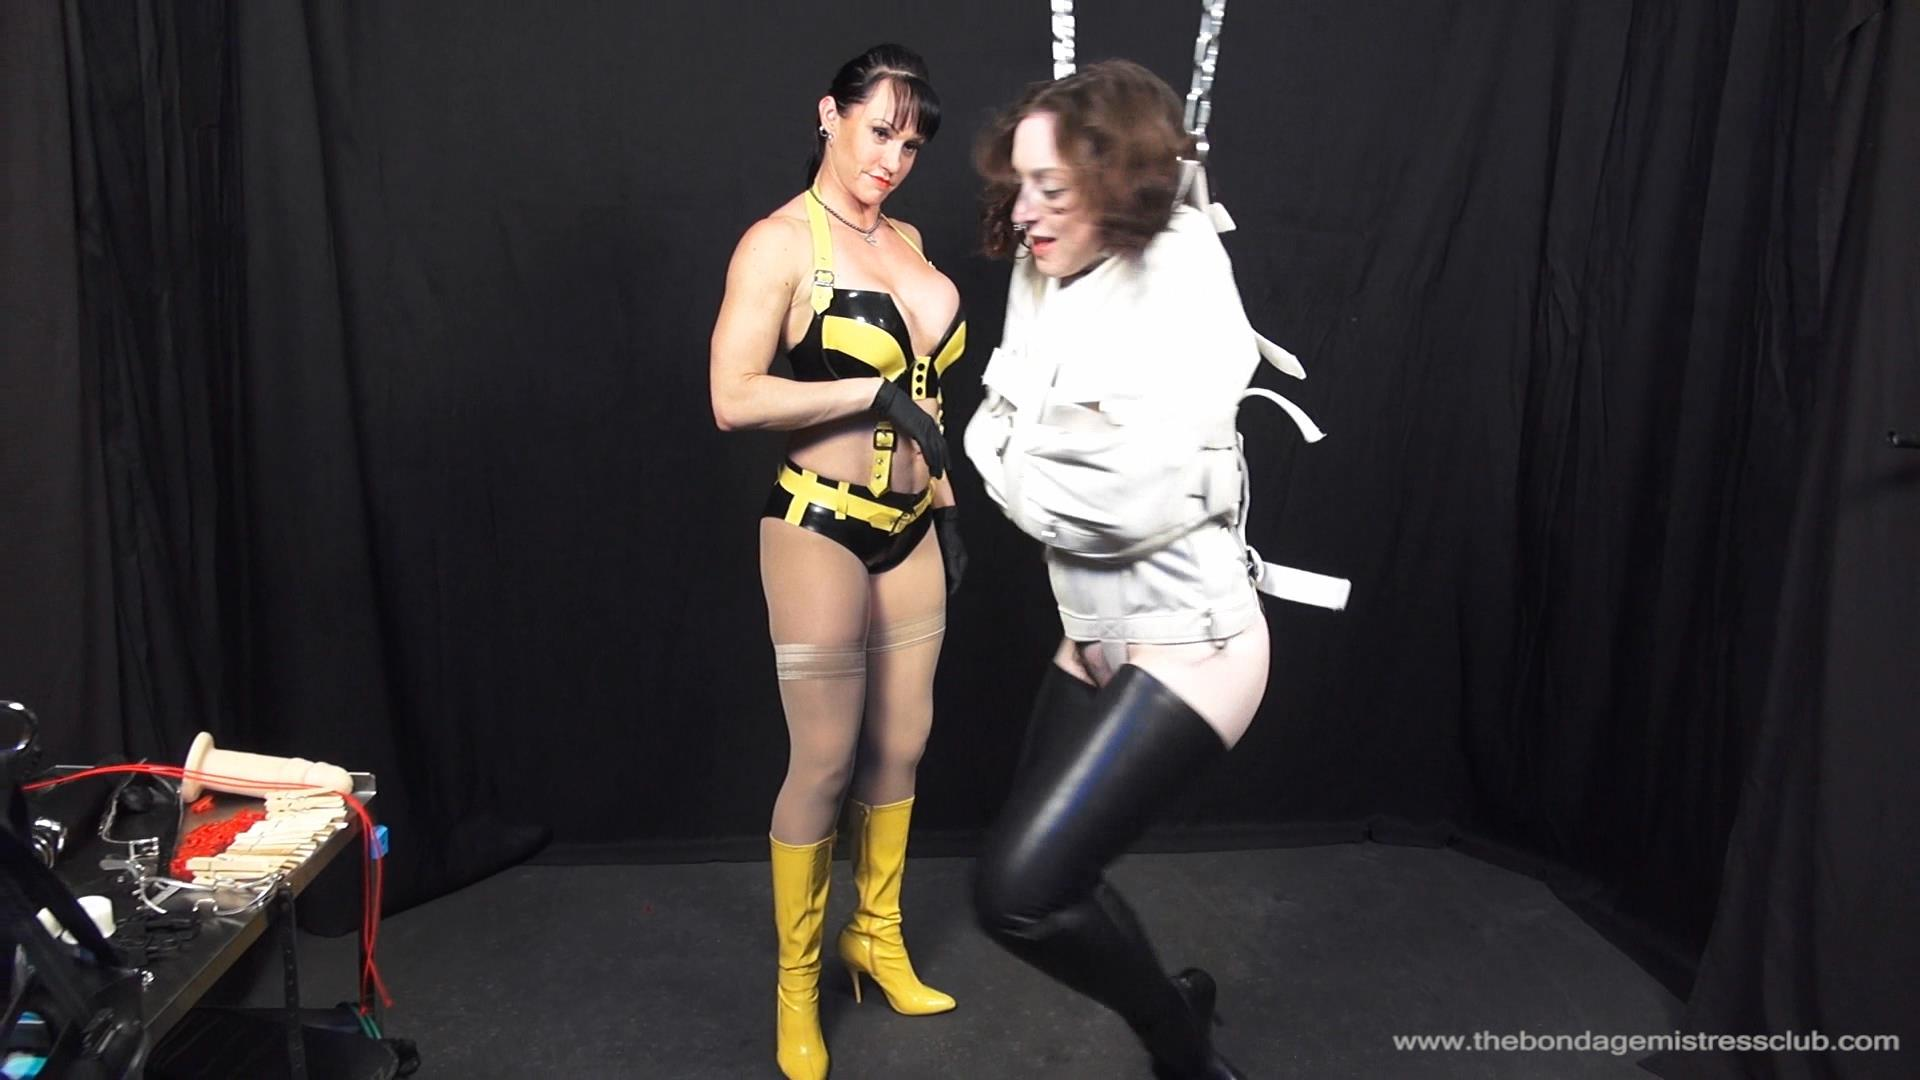 Dixon Mason In Scene: Straitjacket Ballet - THEBONDAGEMISTRESSCLUB - FULL HD/1080p/WMV